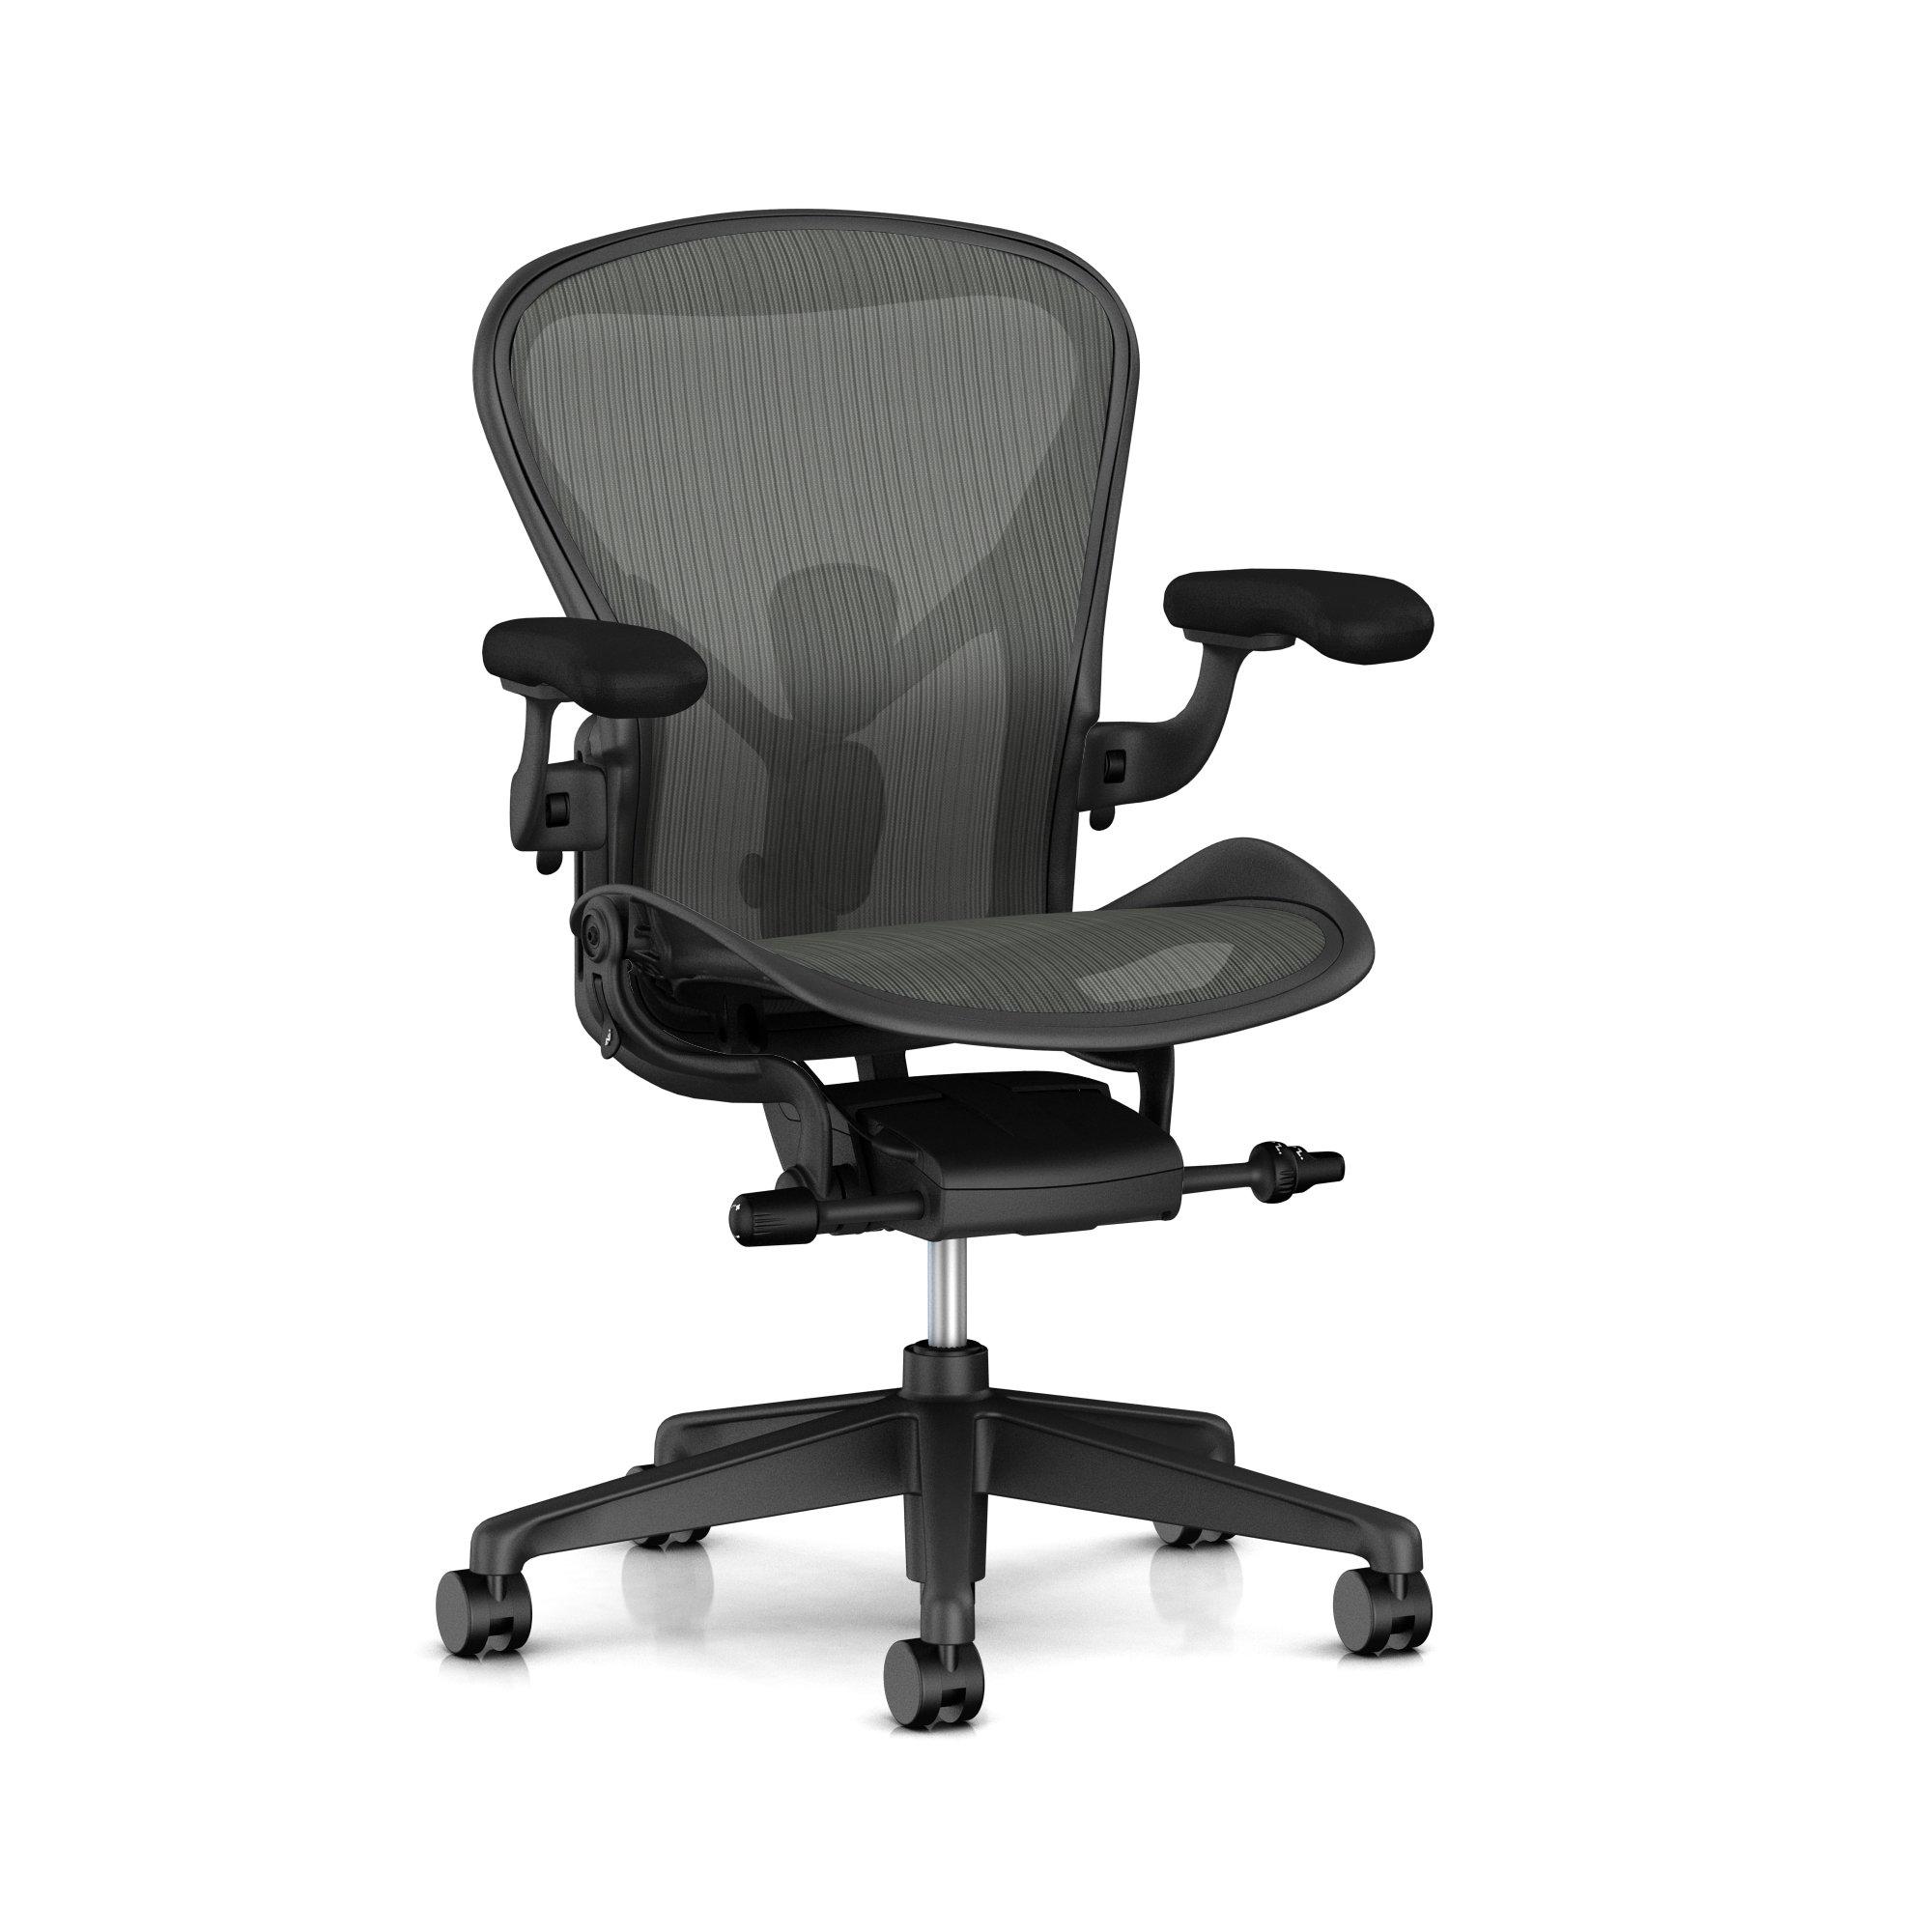 Herman Miller Aeron Chair 2016 Fully Loaded GR Shop